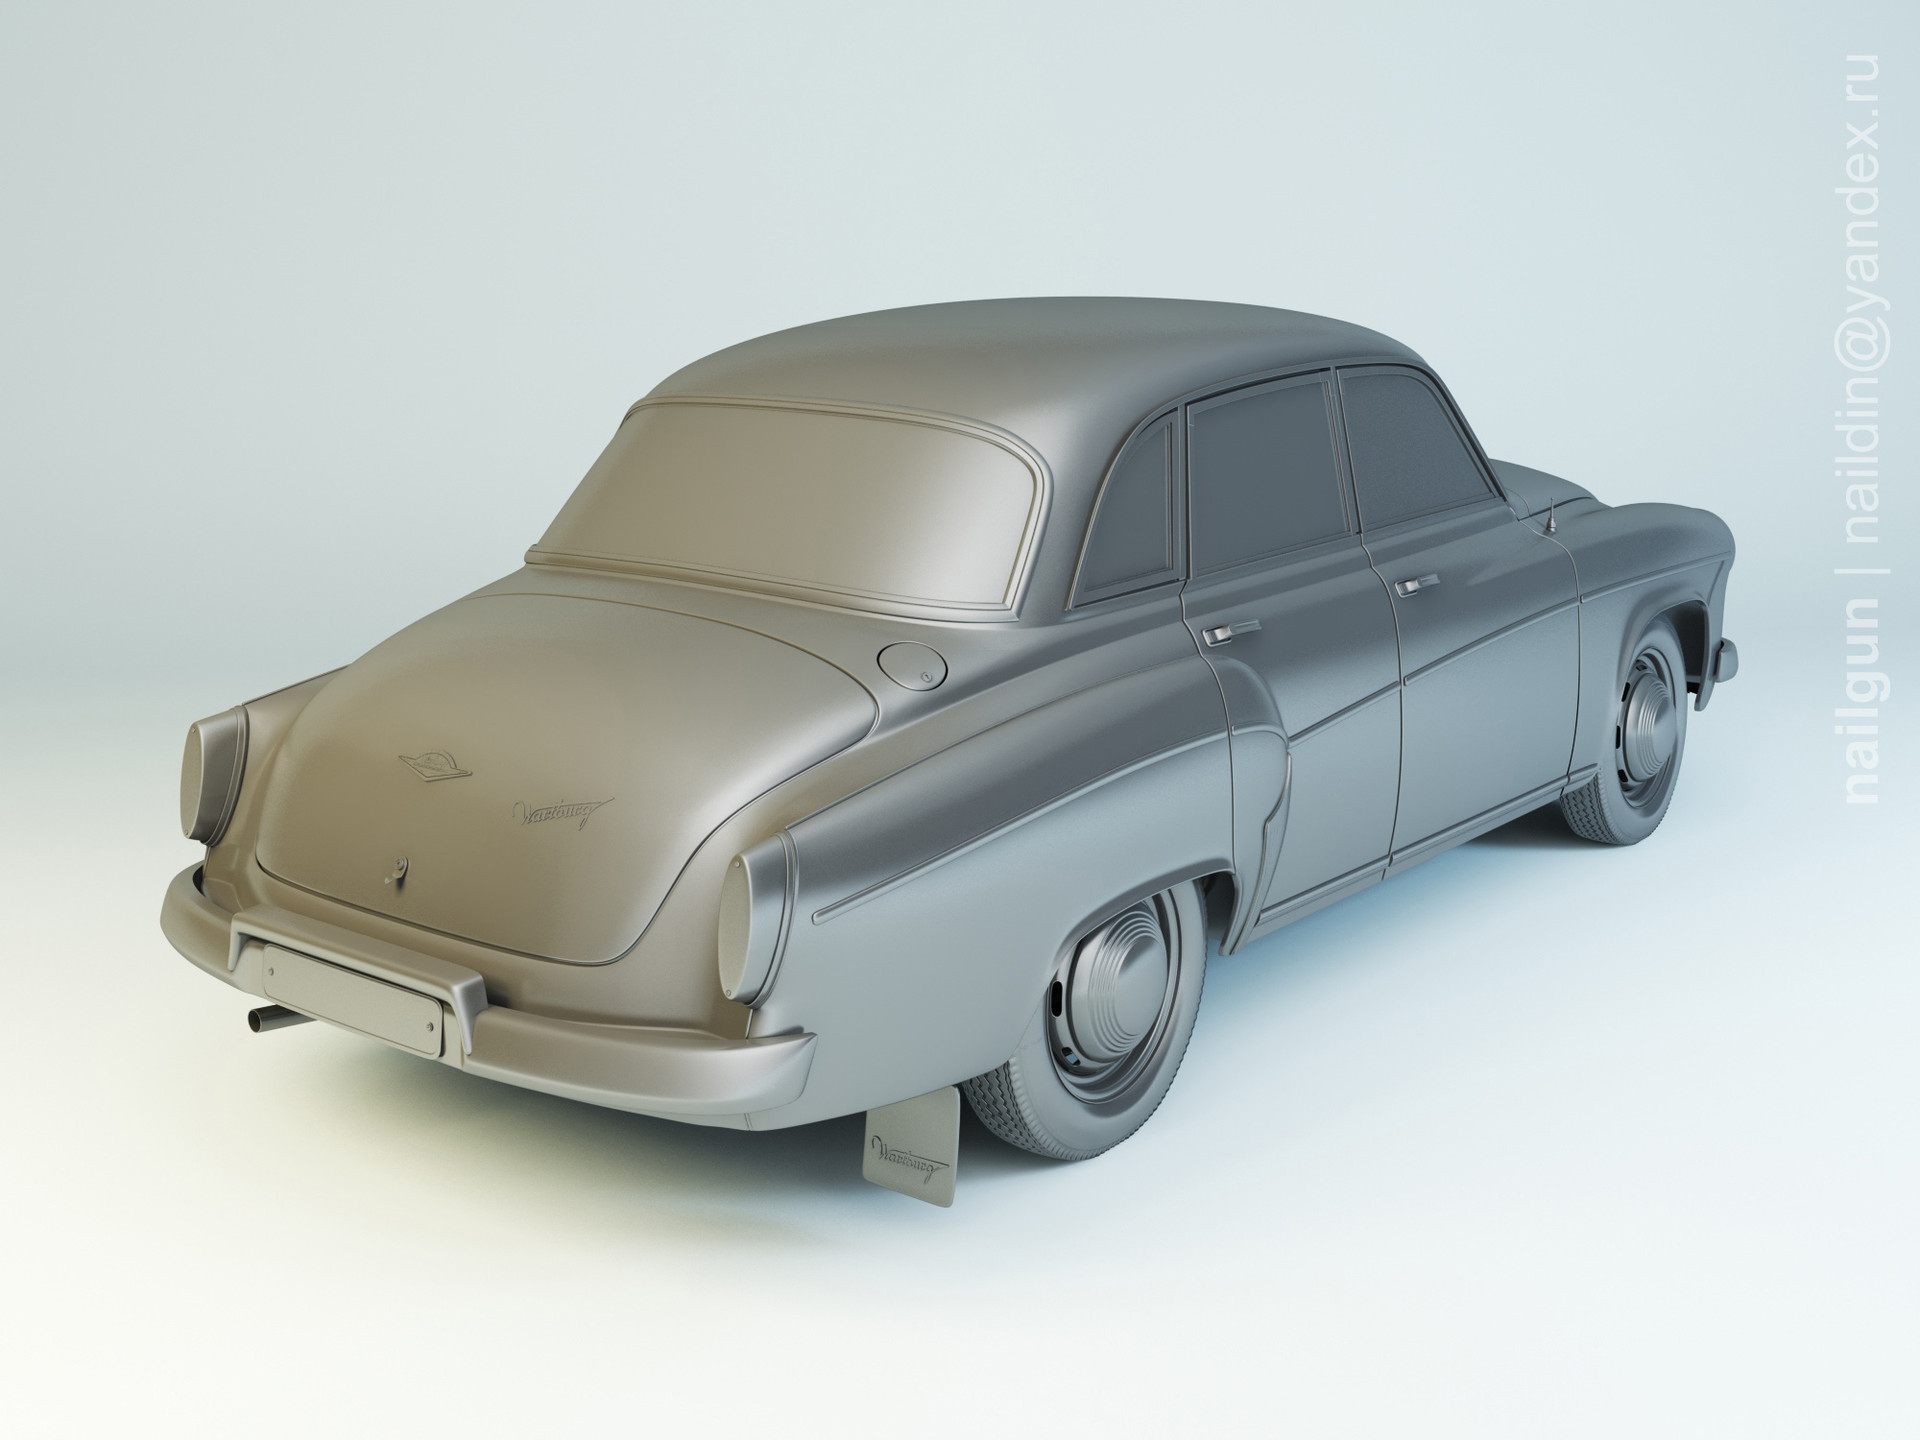 Nail khusnutdinov als 172 004 wartburg 312 modelling 1